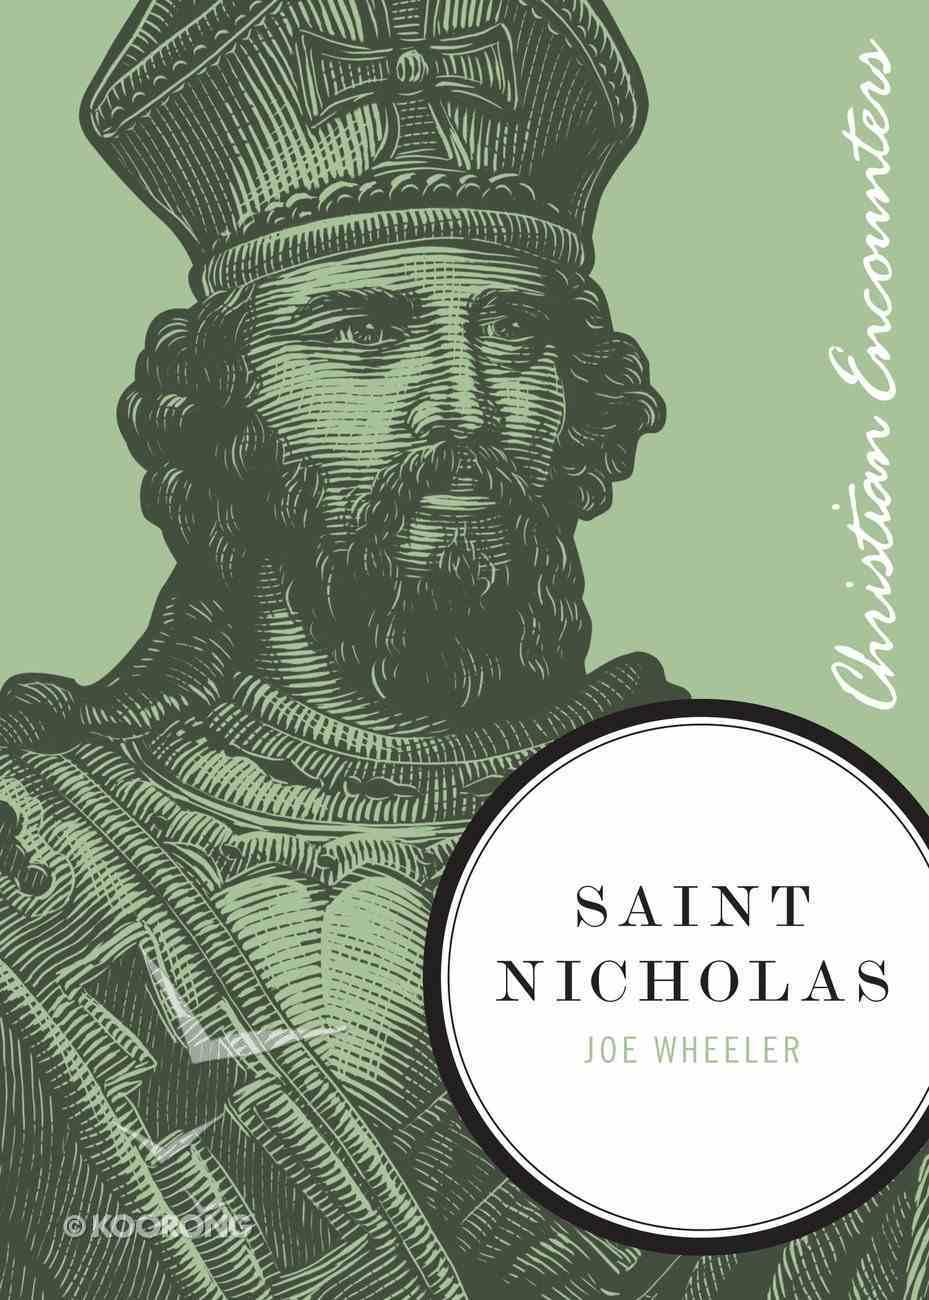 Saint Nicholas (Christian Encounters Series) eBook